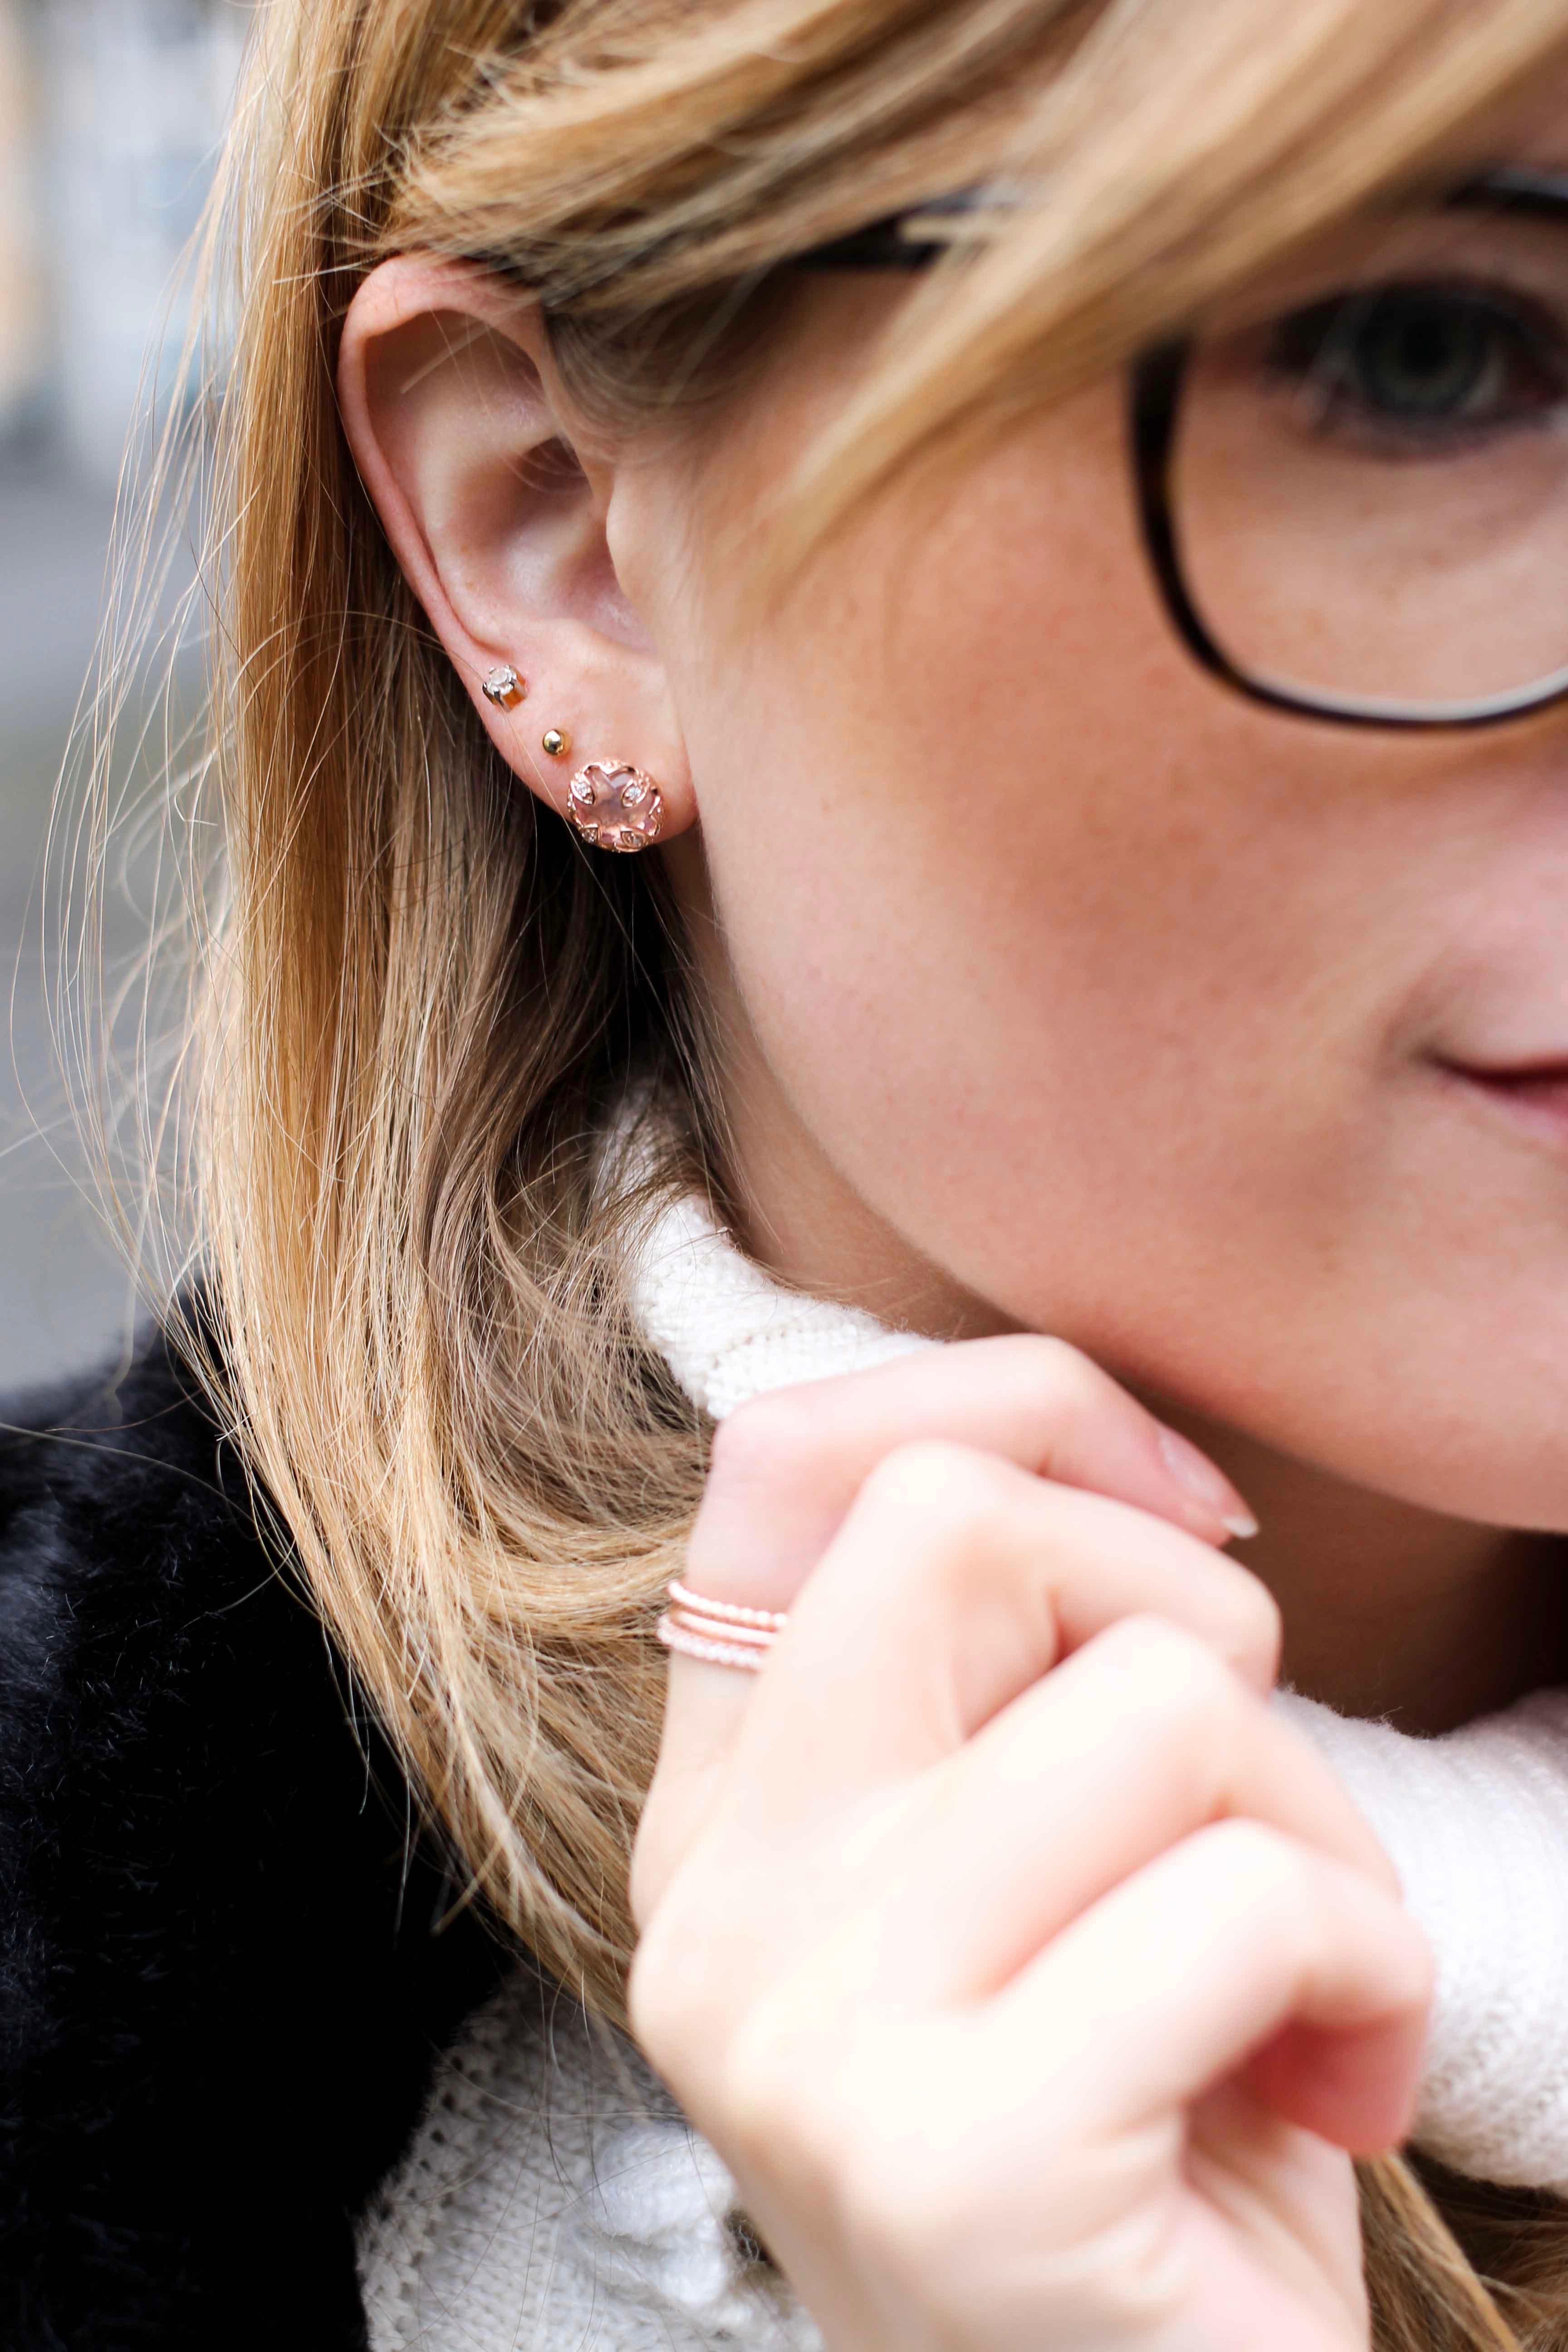 Thomas Sabo rosegold ringe filigran rosegoldener Schmuck Accessoires Ohrringe kombinieren